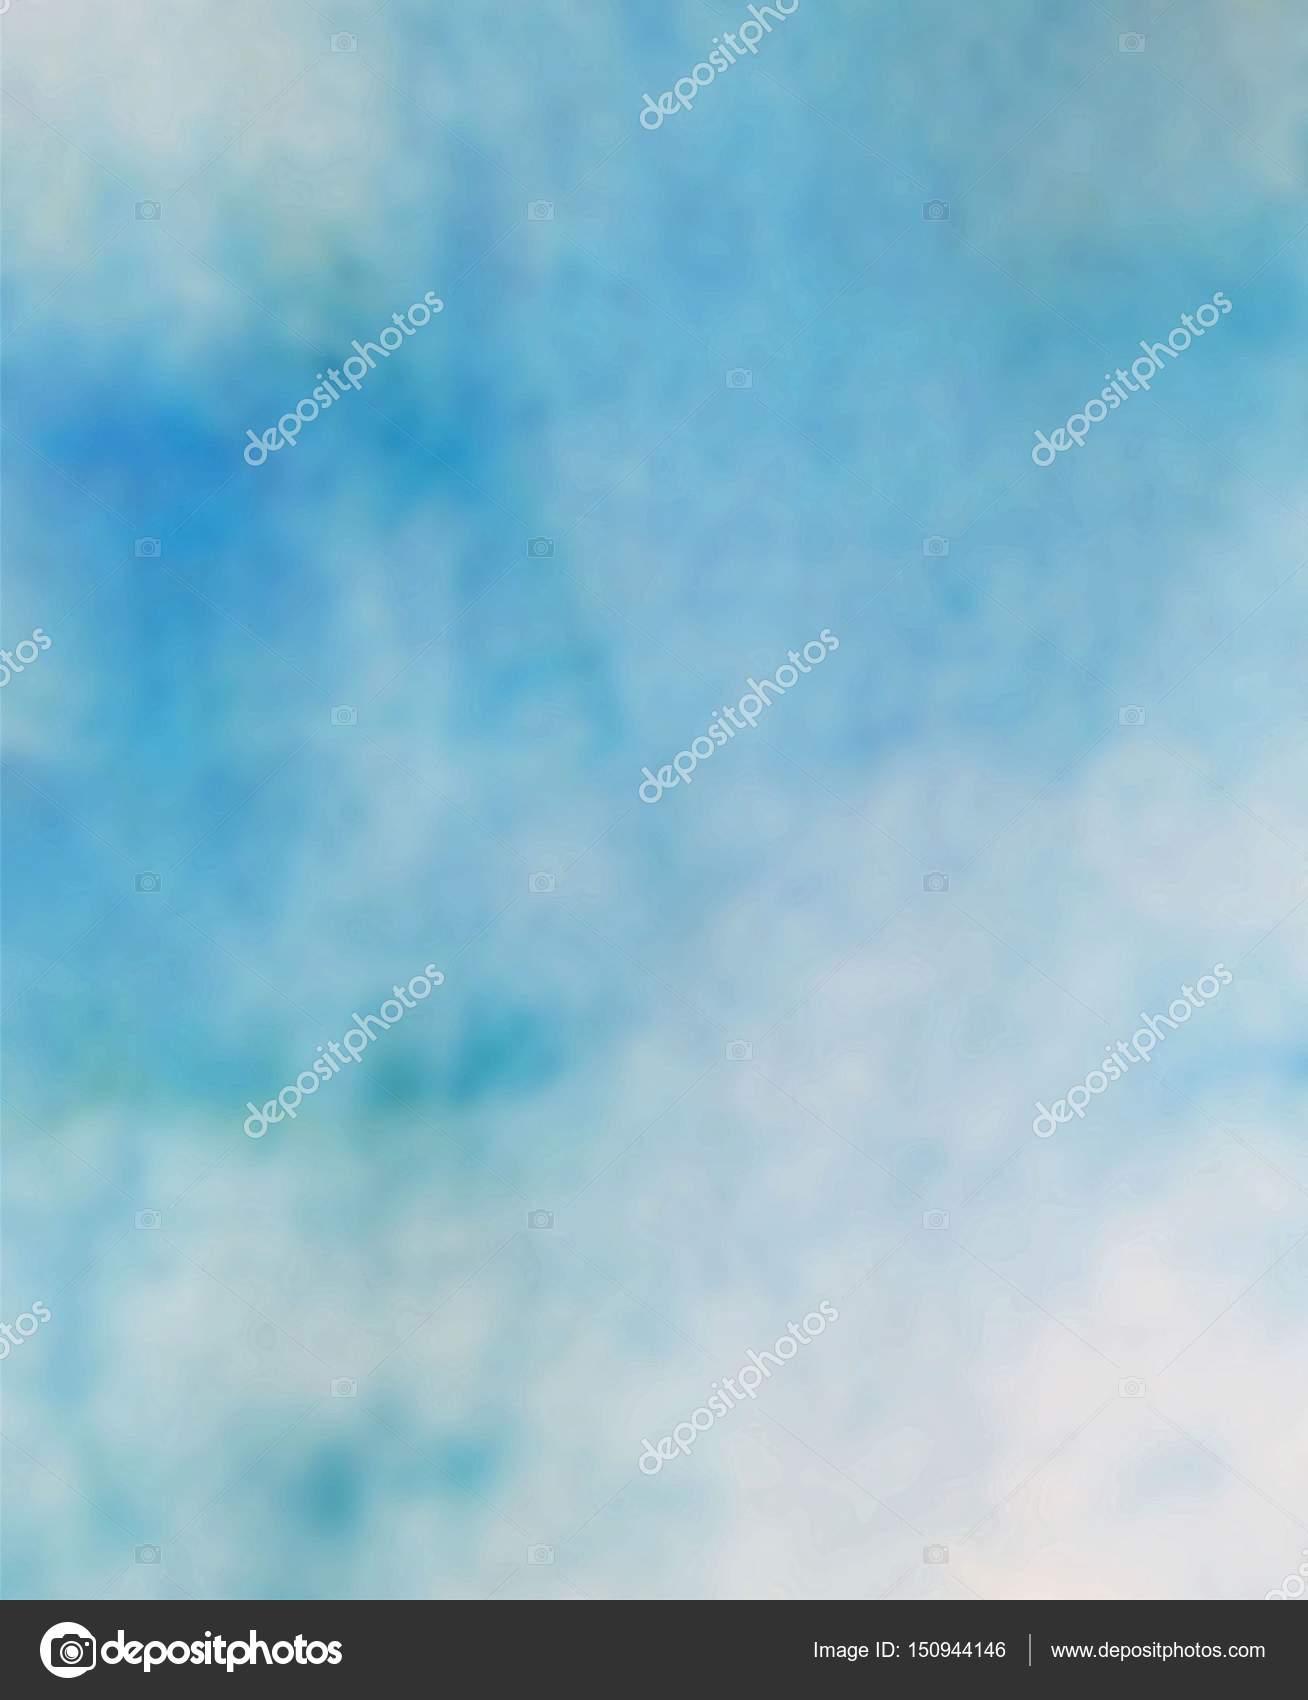 Grunge Wallpaper Iphone Blurred Grunge Background Stock